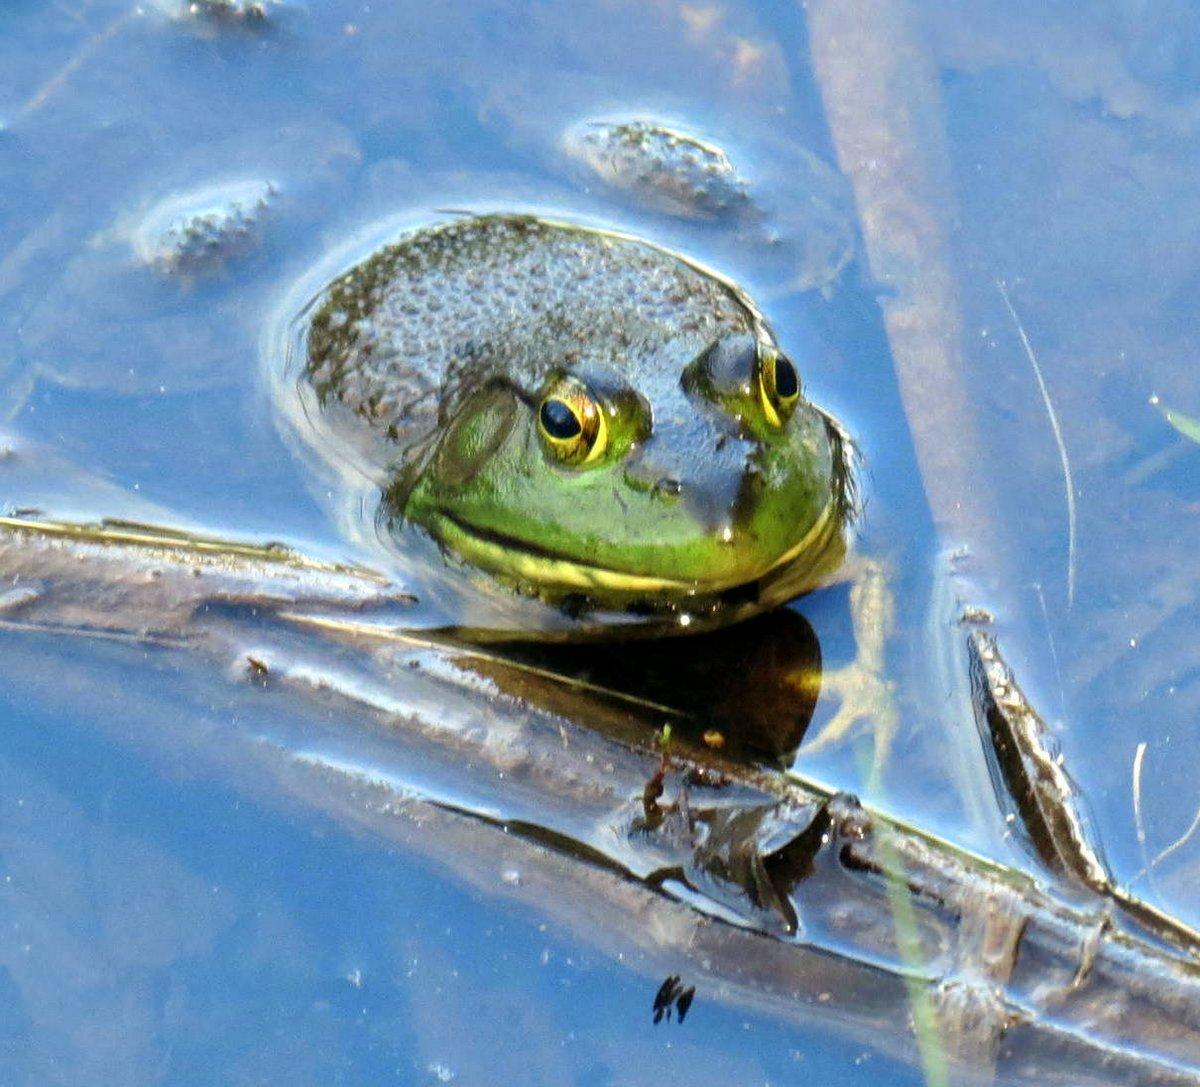 12. Frog